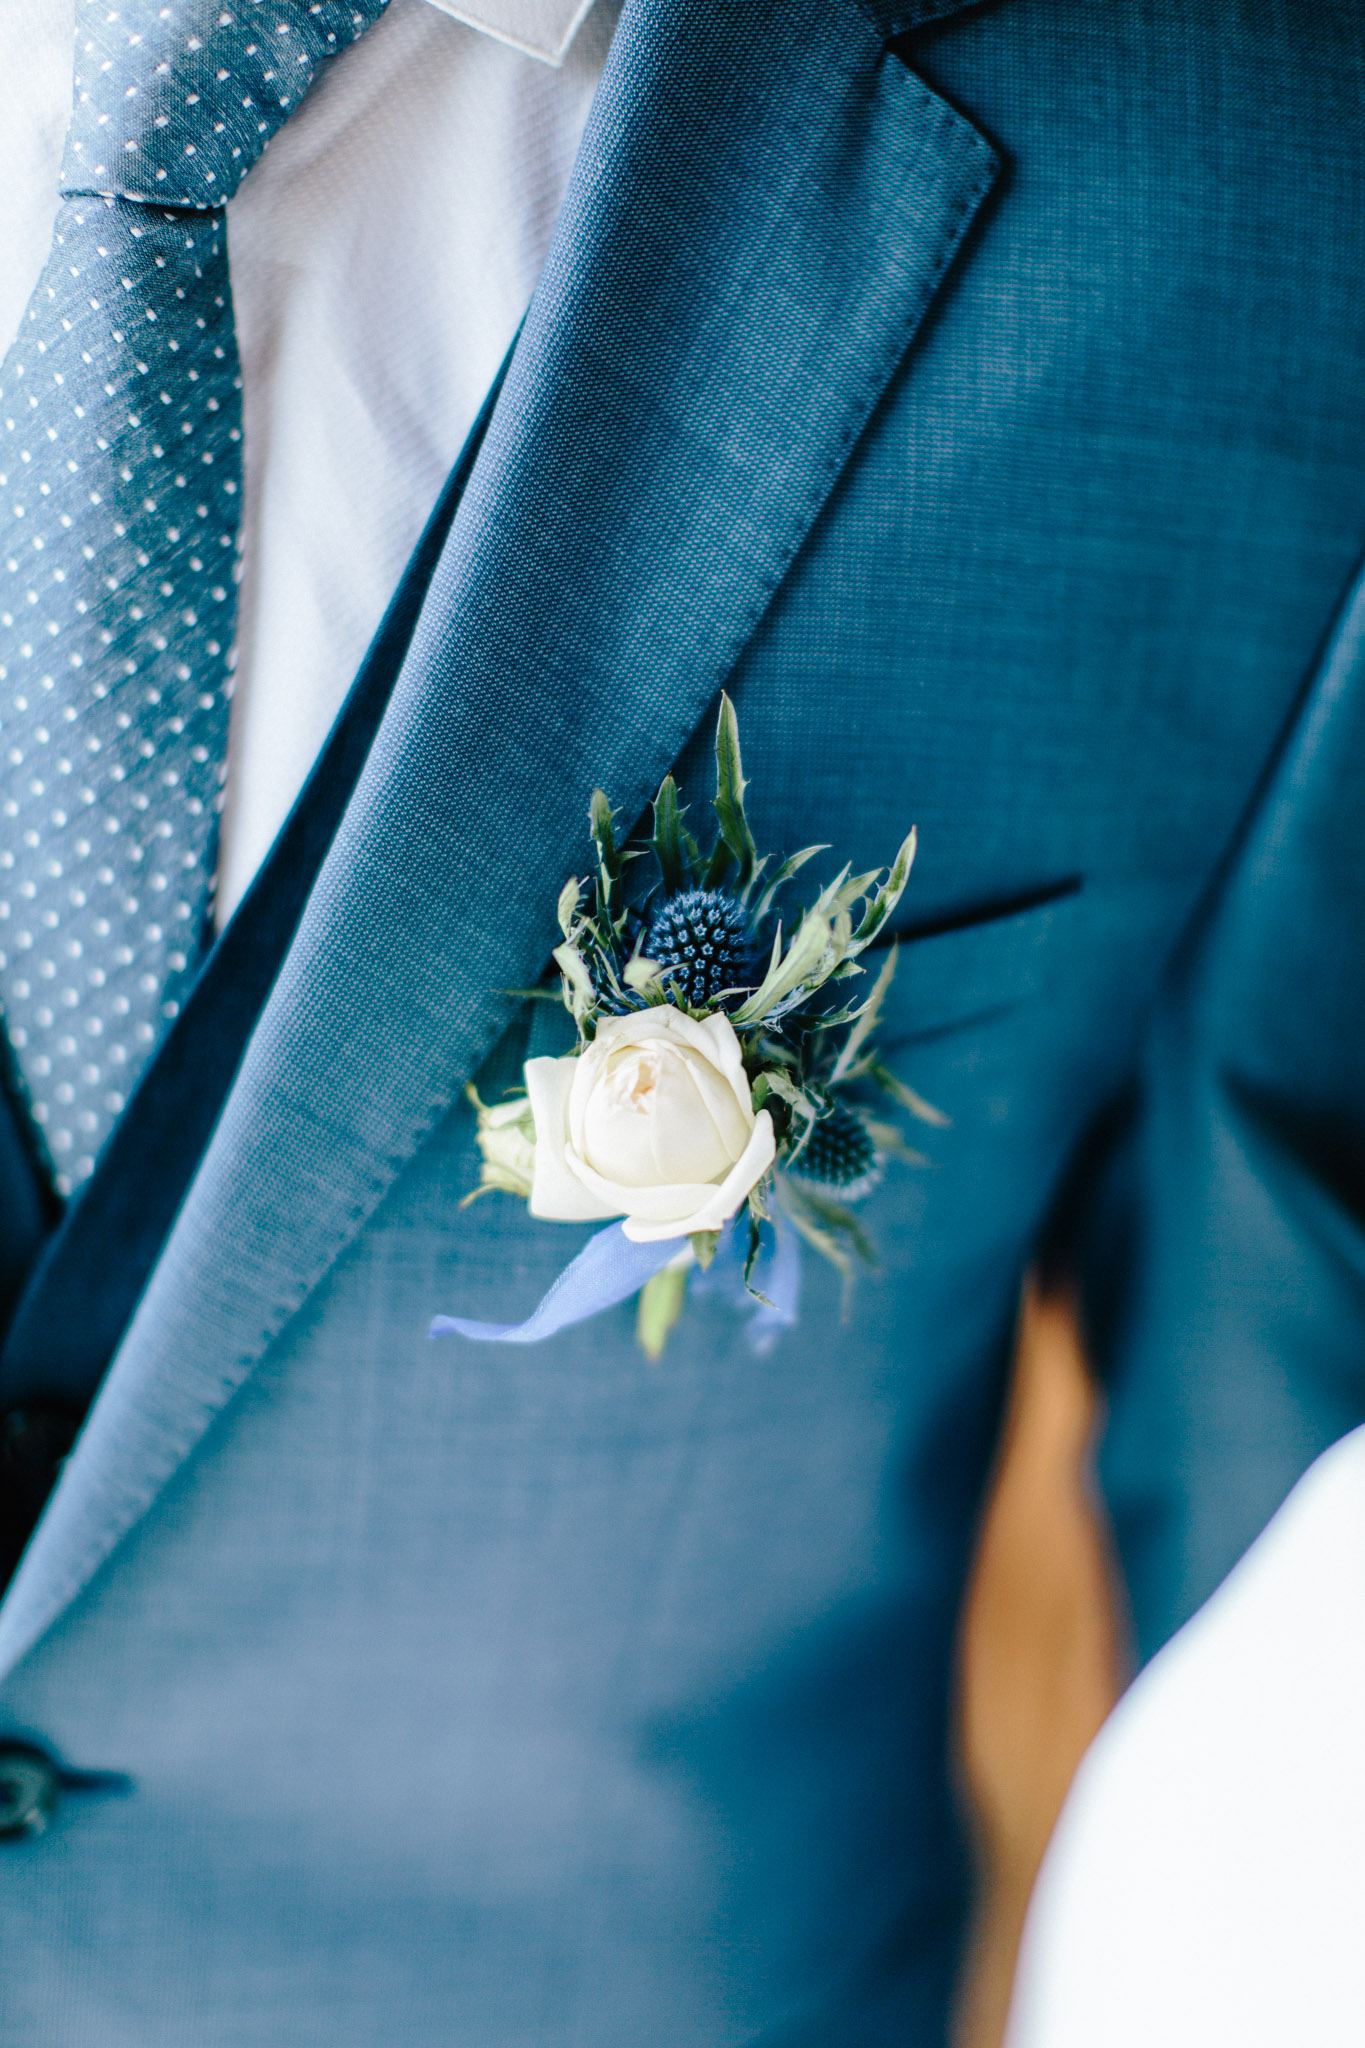 Lenl-Simmental-Buehlerhof-Pia-Anna-Christian-Wedding-Photography-EK-42.jpg